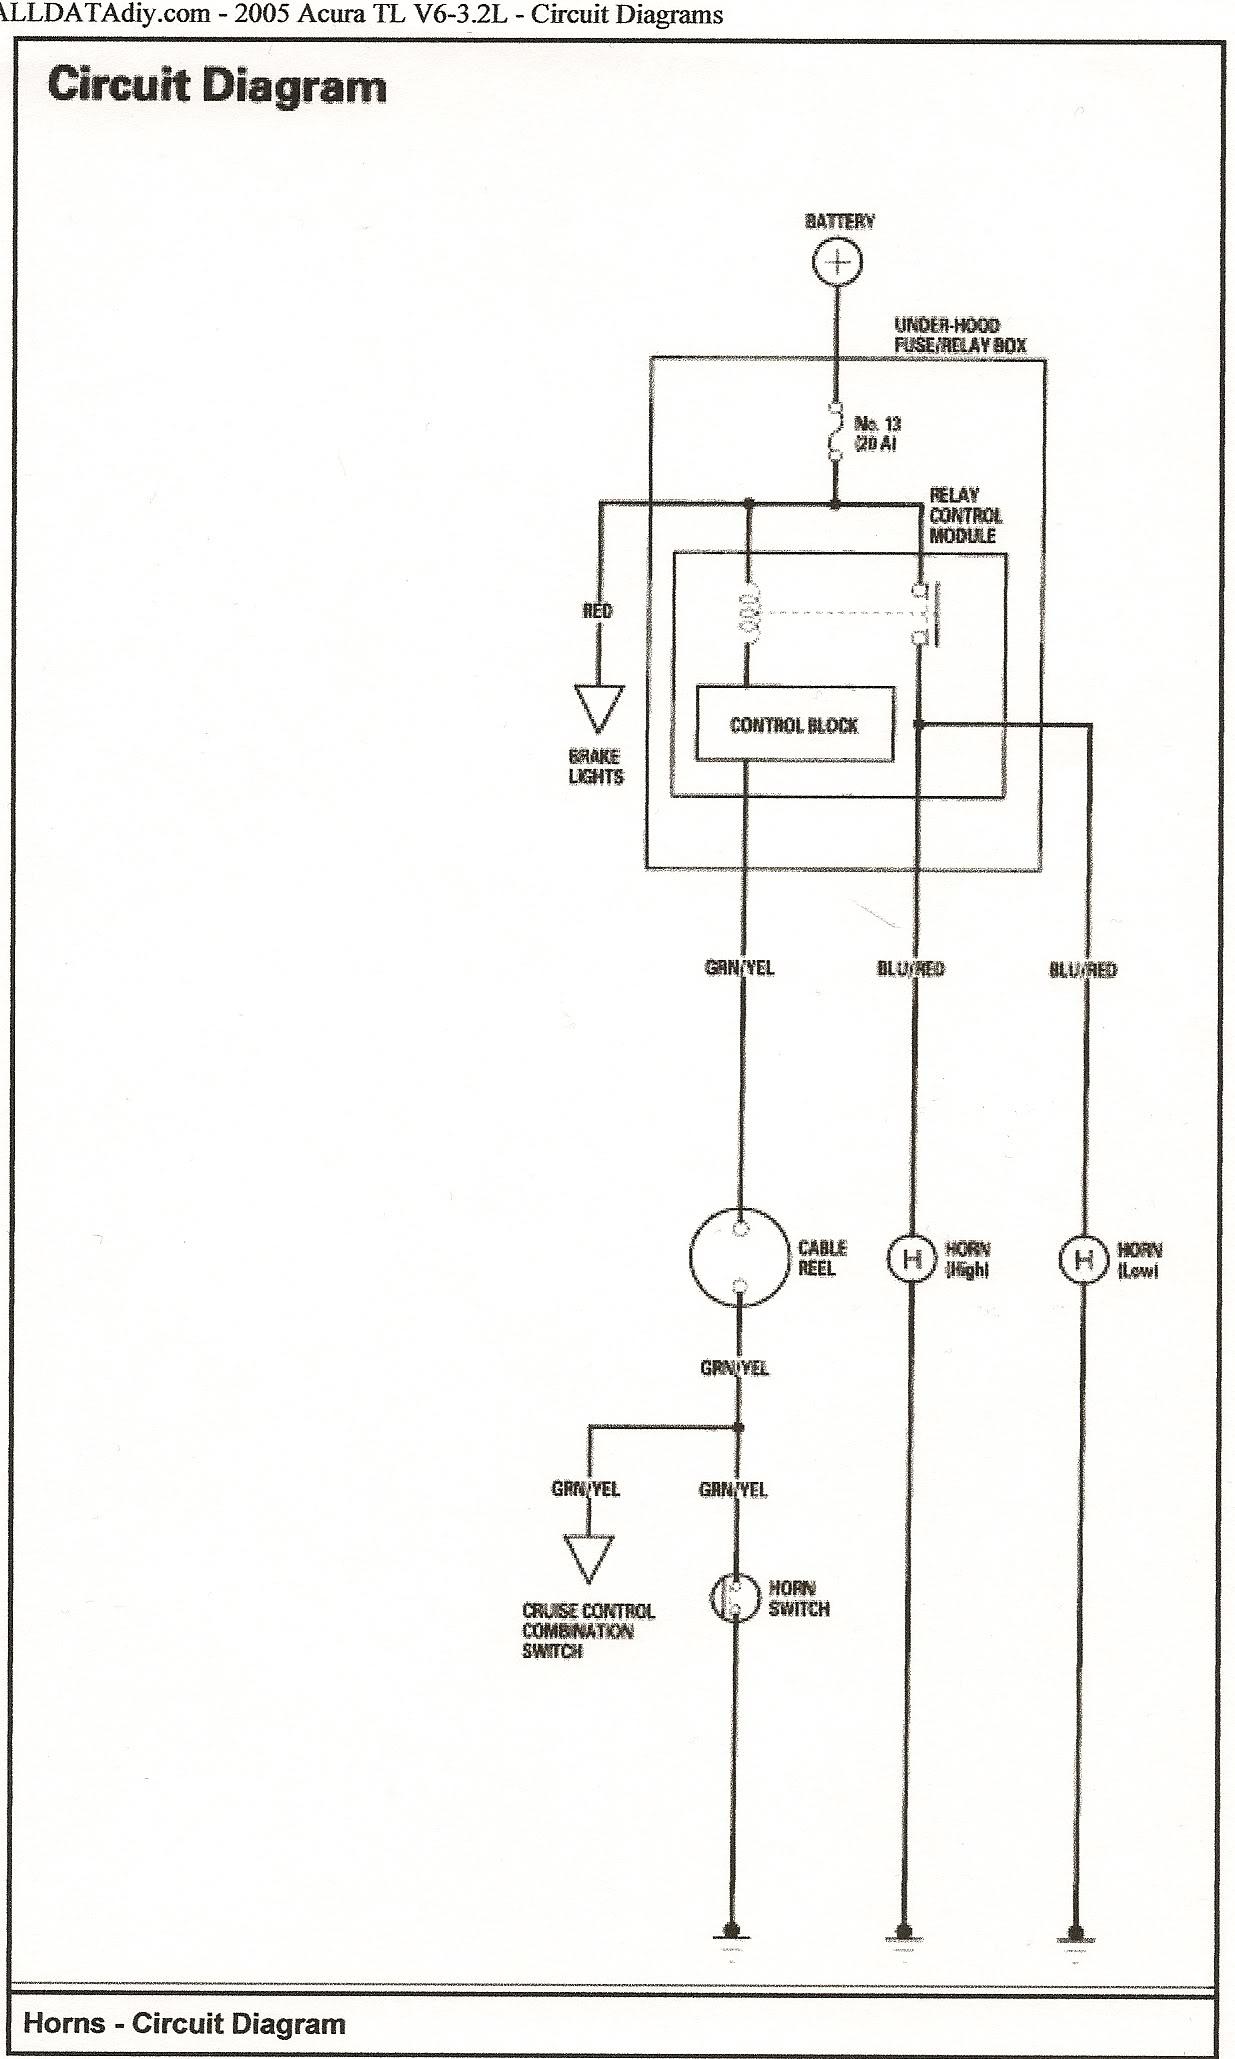 alpine cda 9856 wiring diagram mach 460 acura tl fuse box recall library